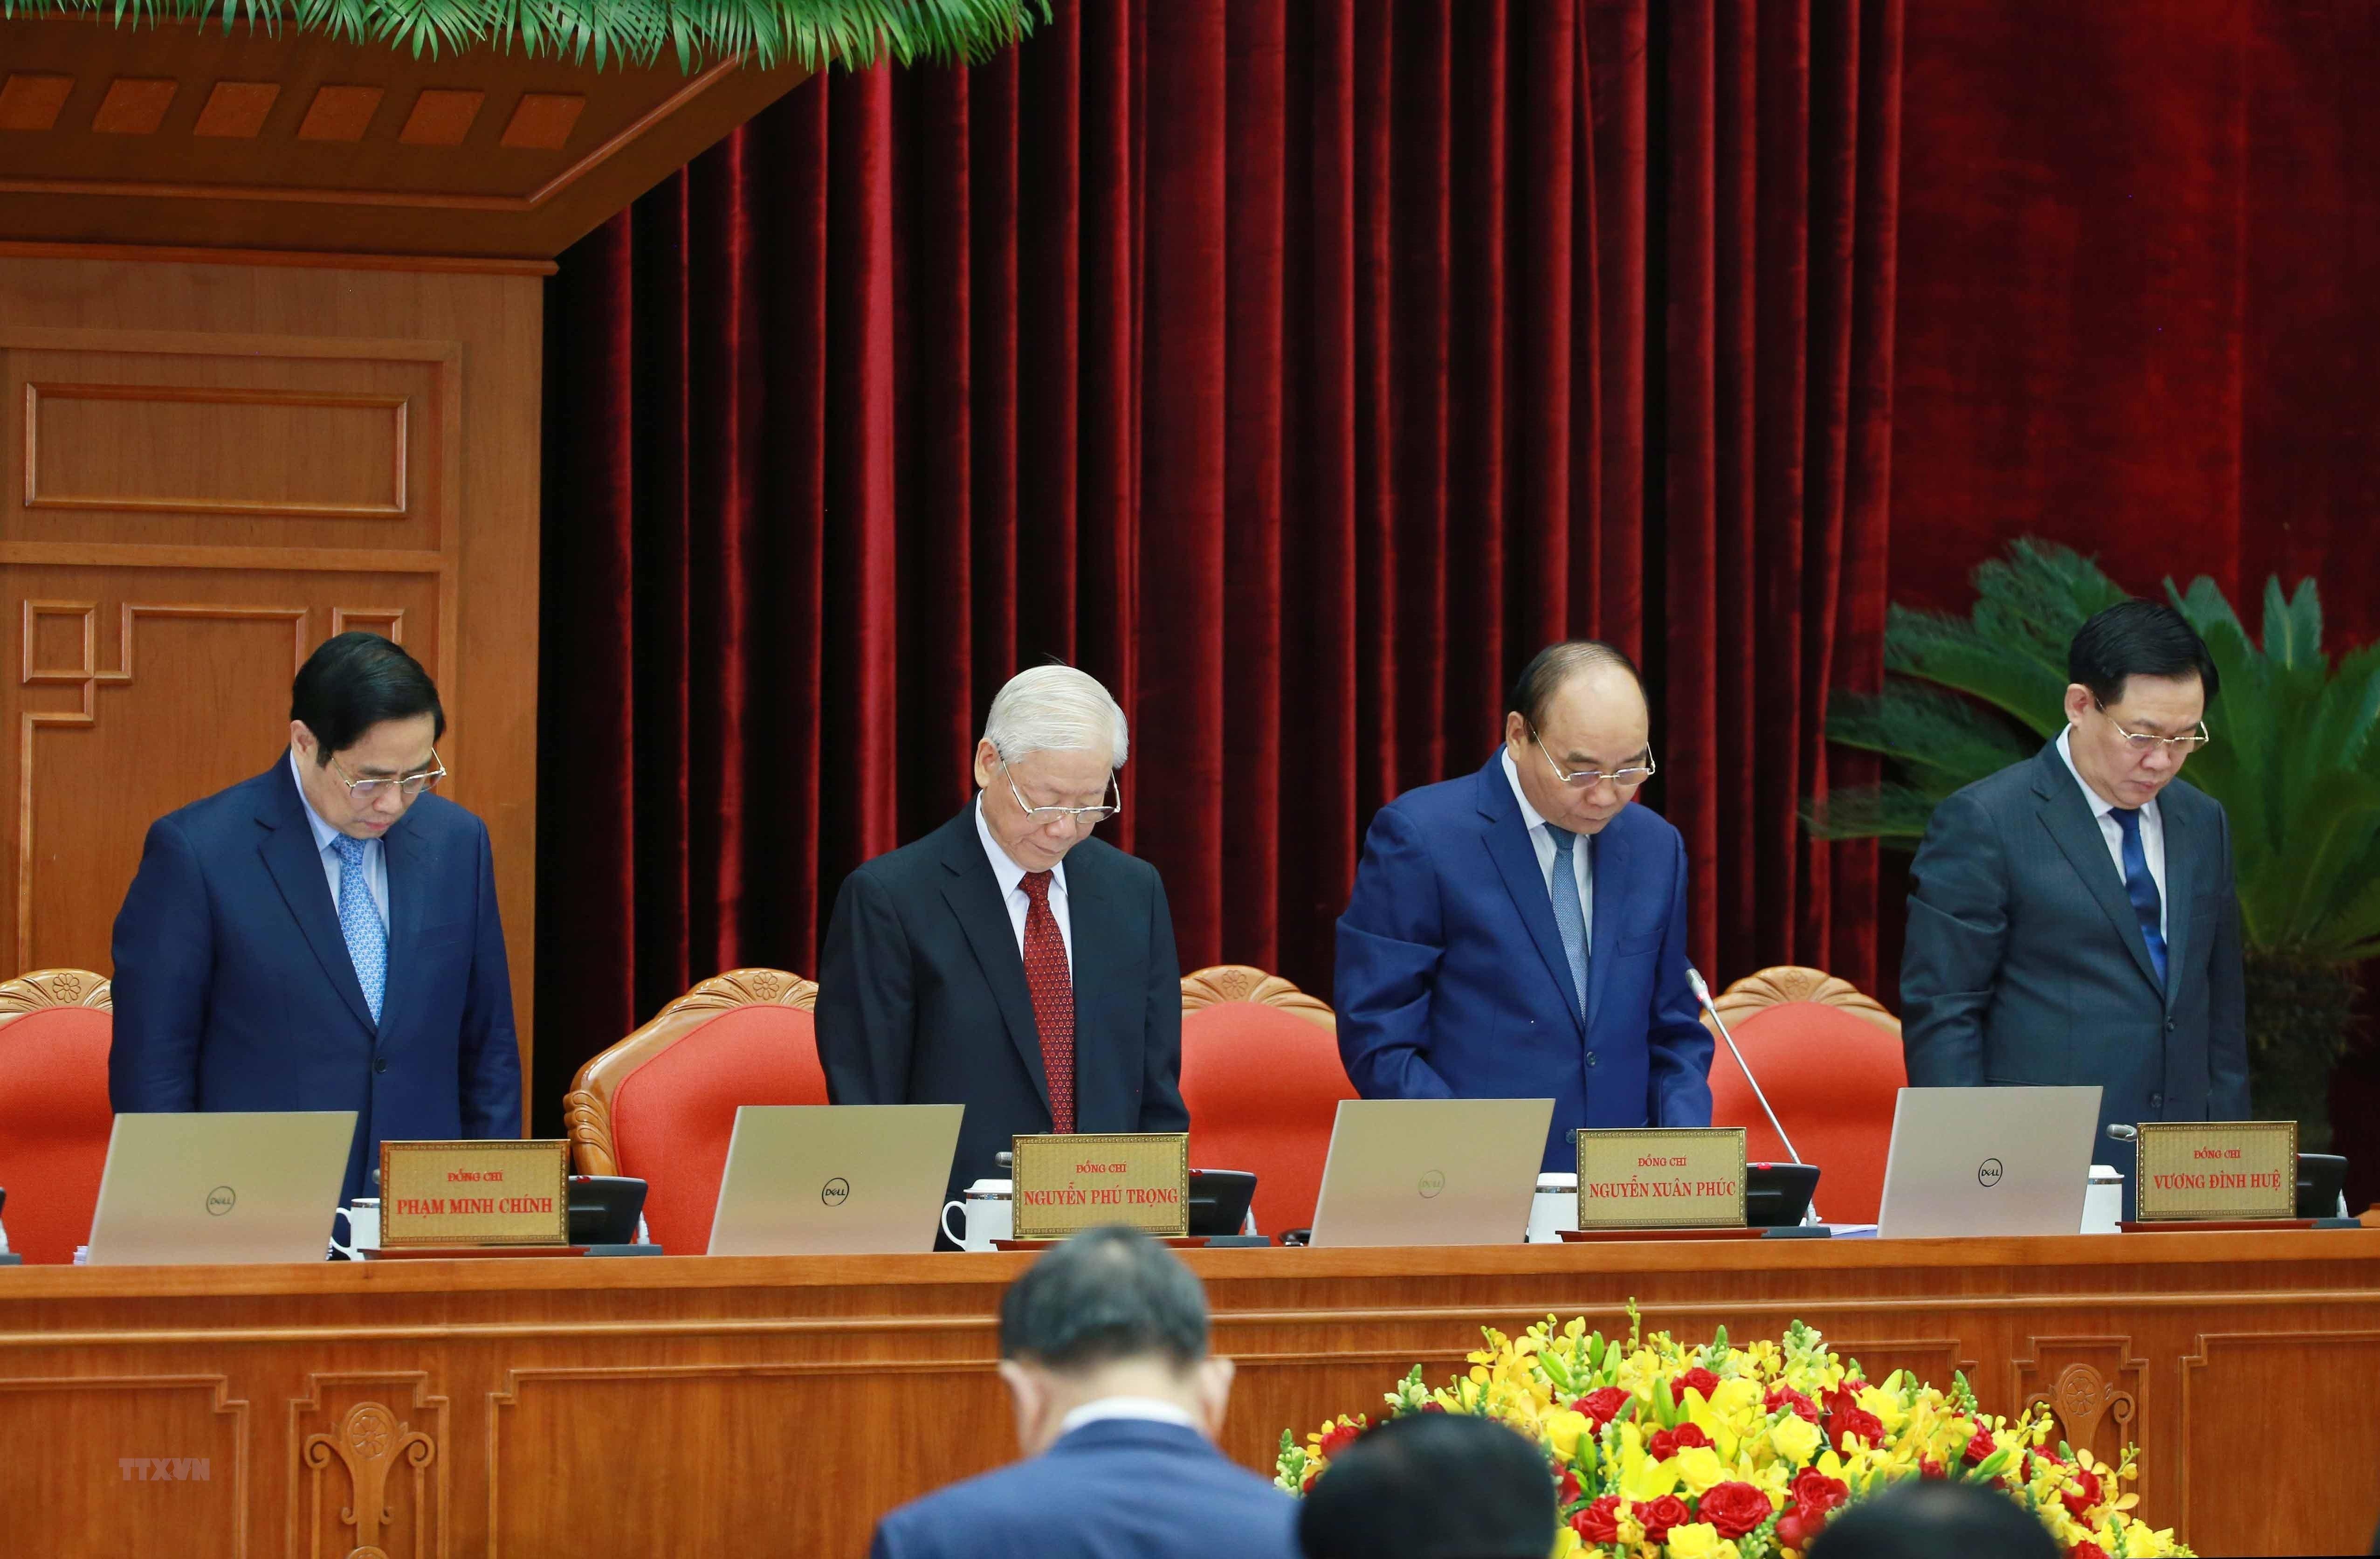 [Photo] Hoi nghi lan thu tu Ban Chap hanh Trung uong Dang khoa XIII hinh anh 11